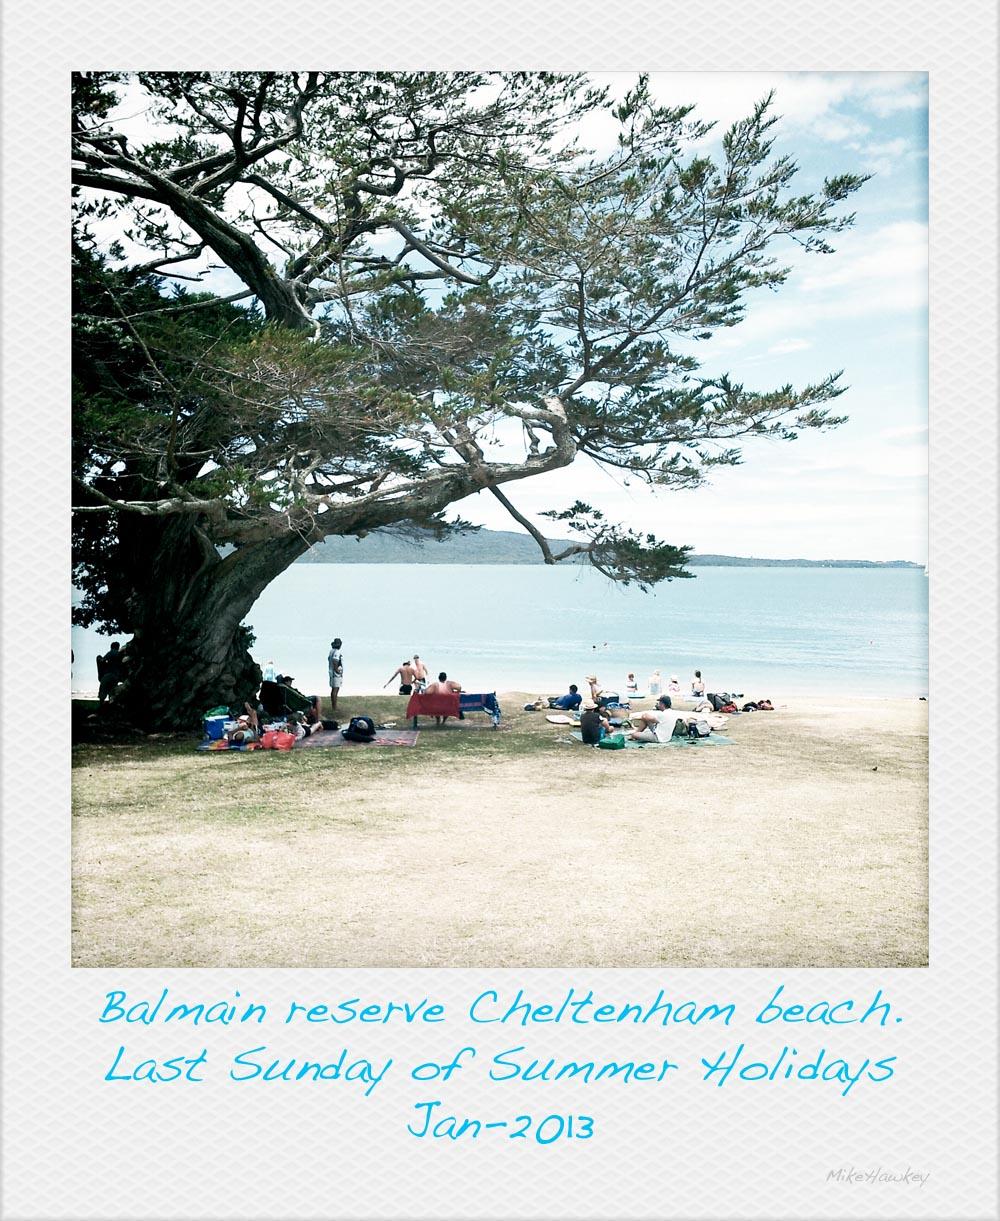 Balmain Reserve